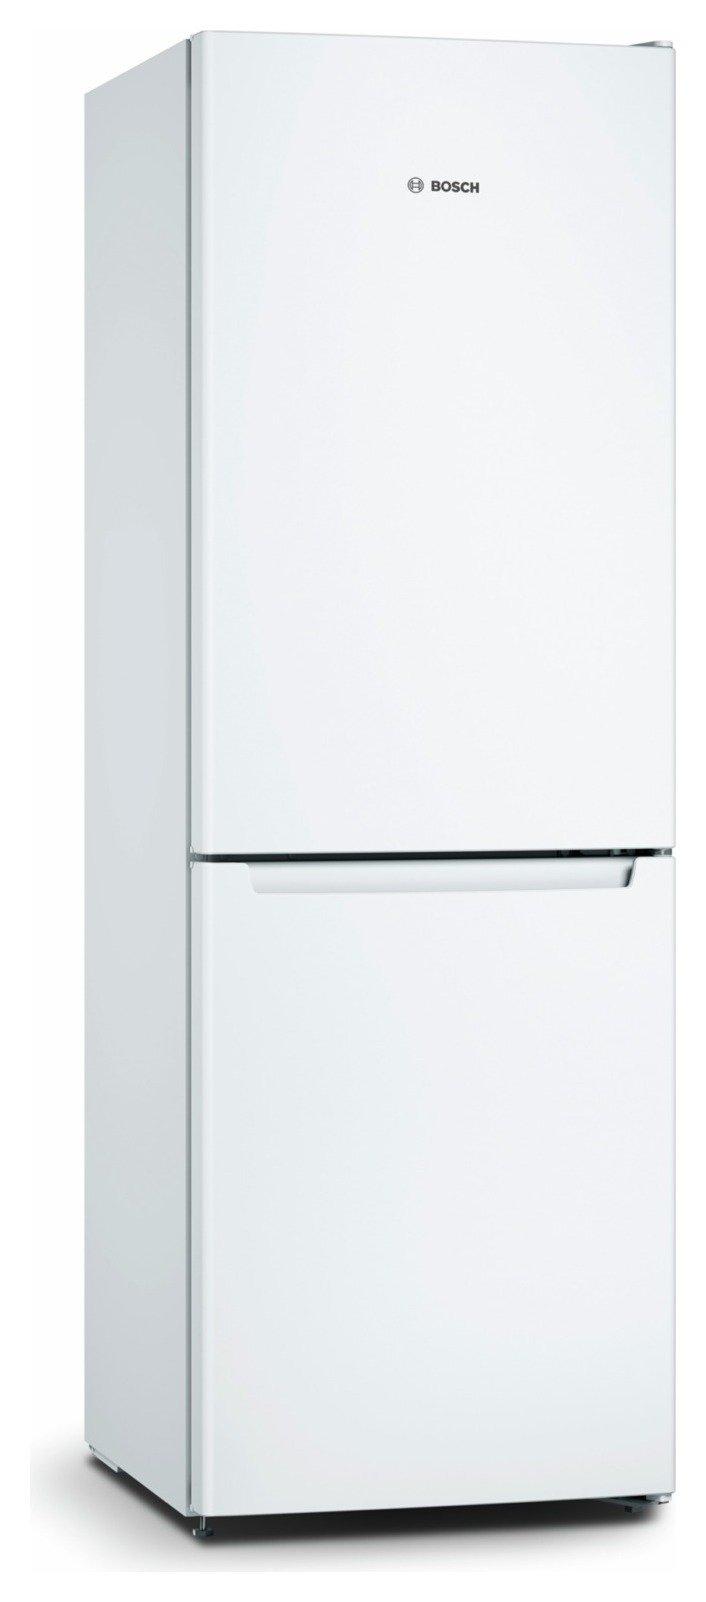 Image of Bosch KGN33NW20G Fridge Freezer - White